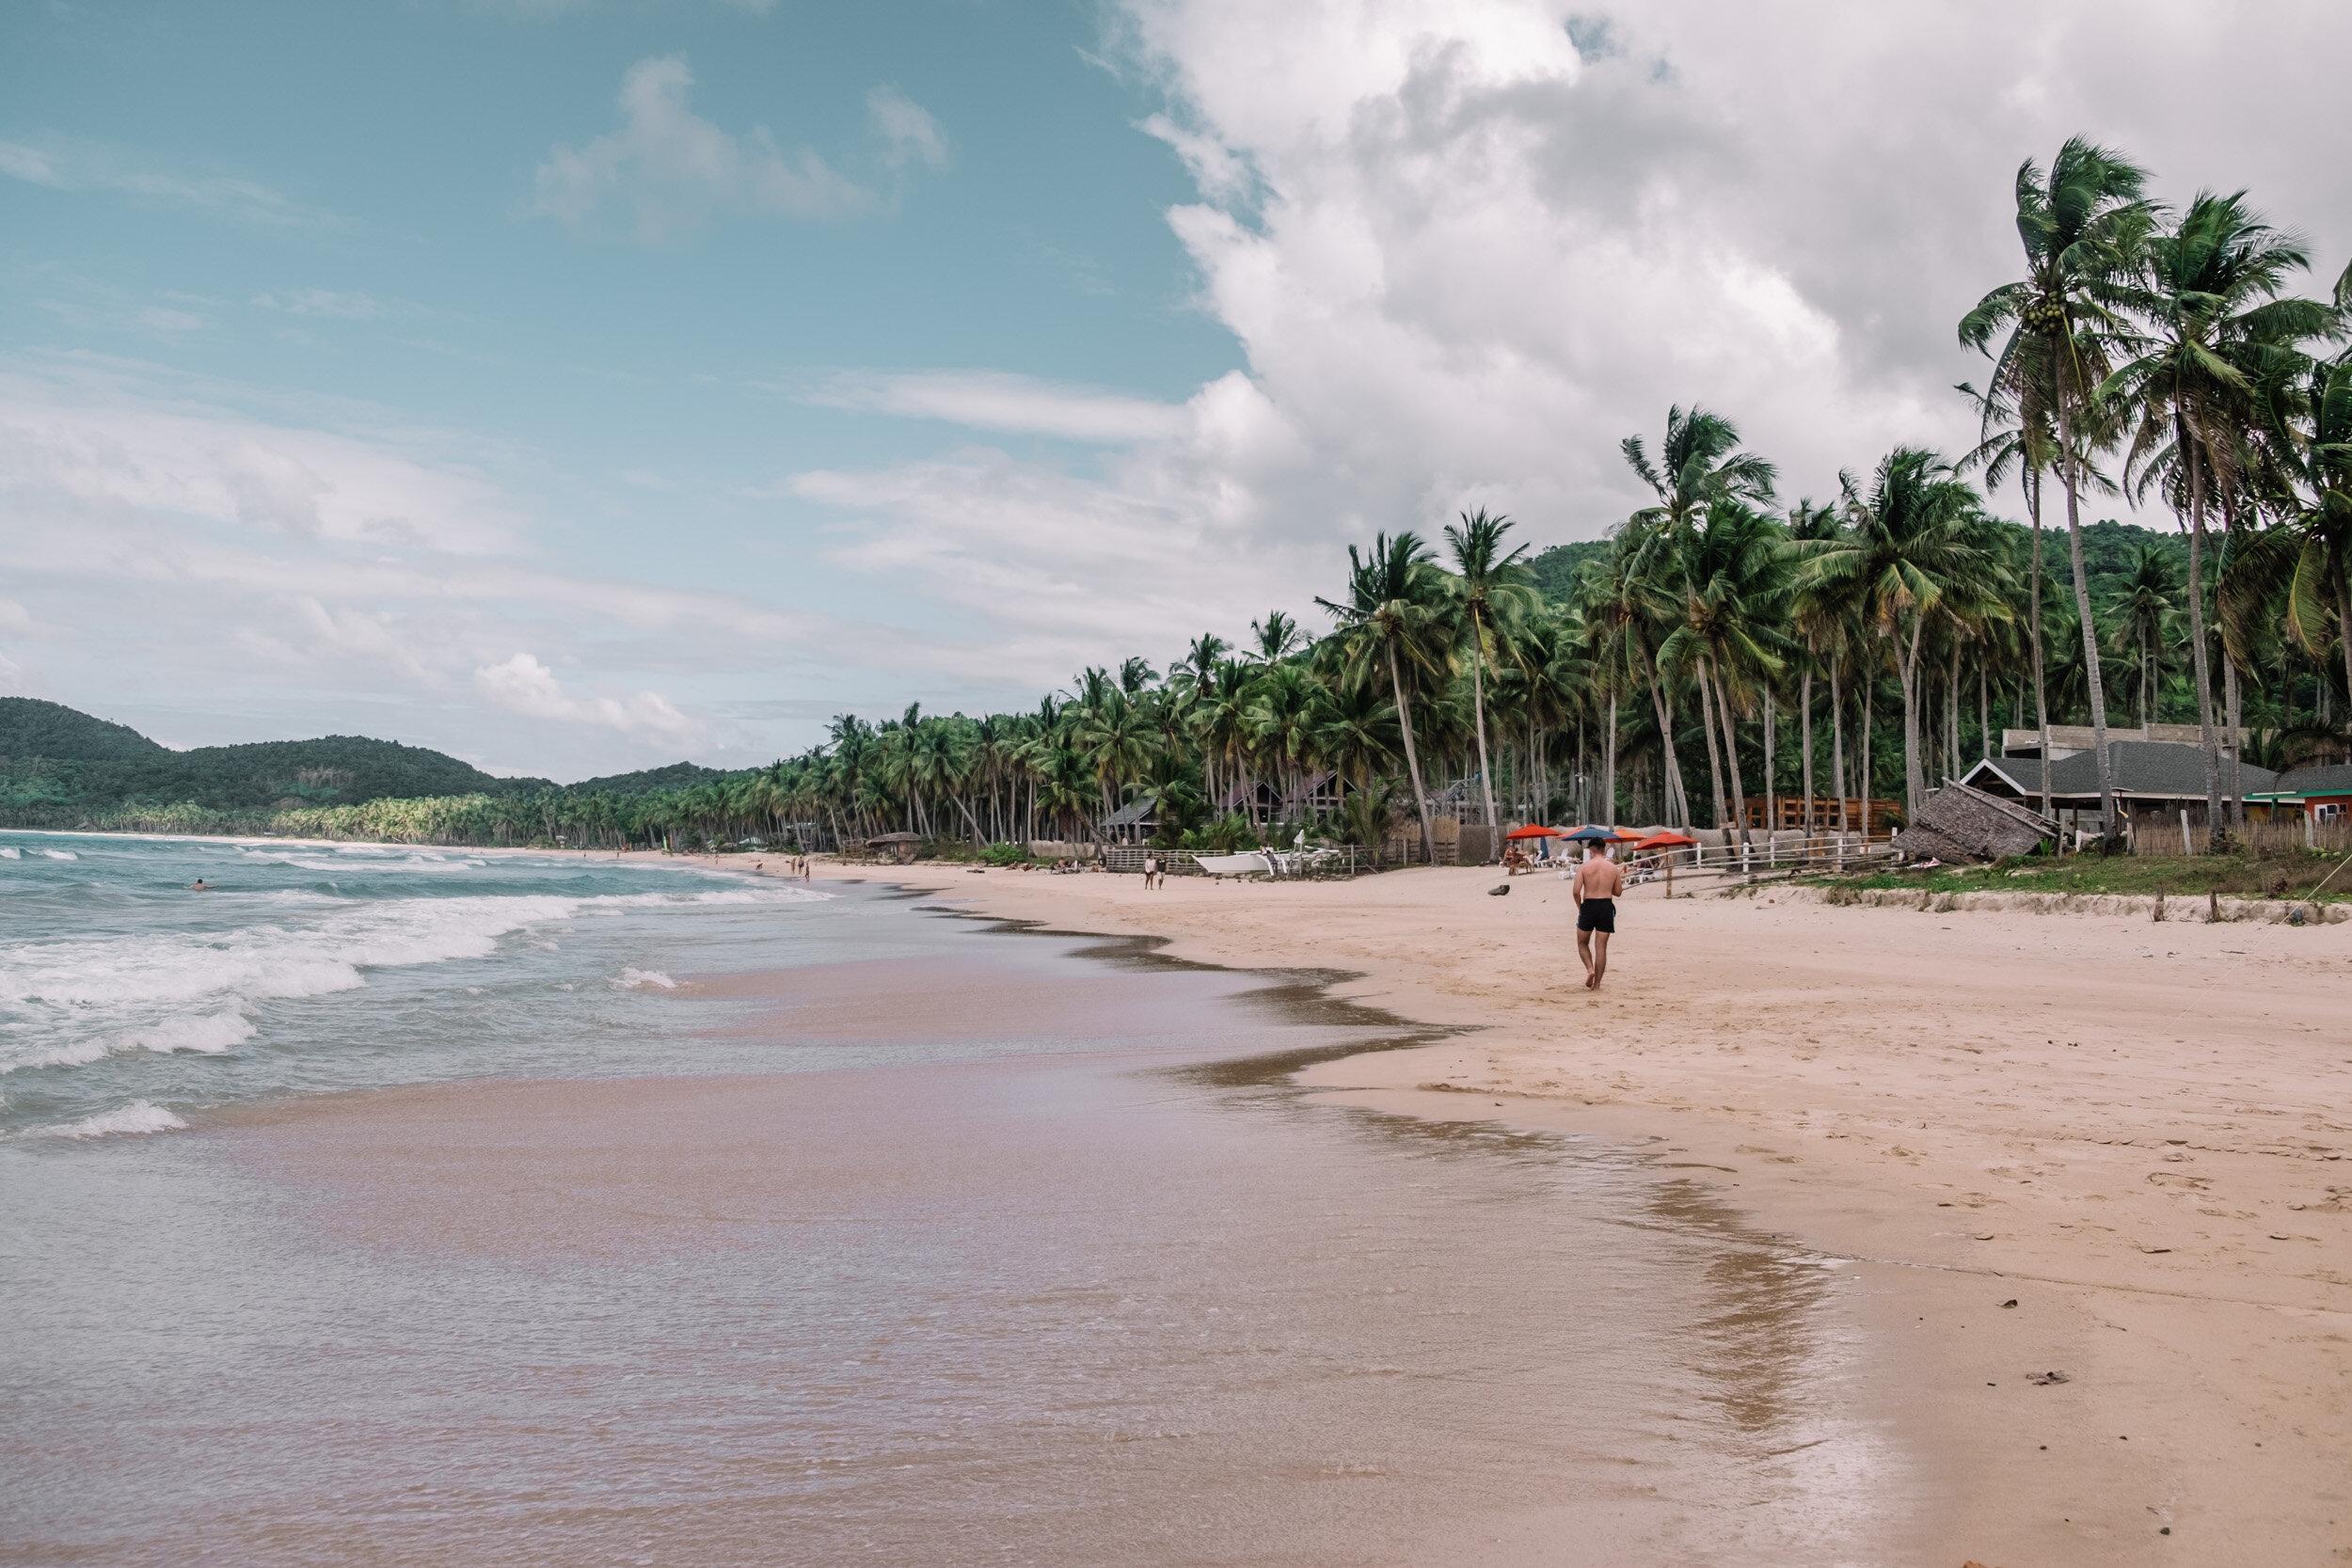 Rachel Off Duty: Nacpan Beach, El Nido, Philippines